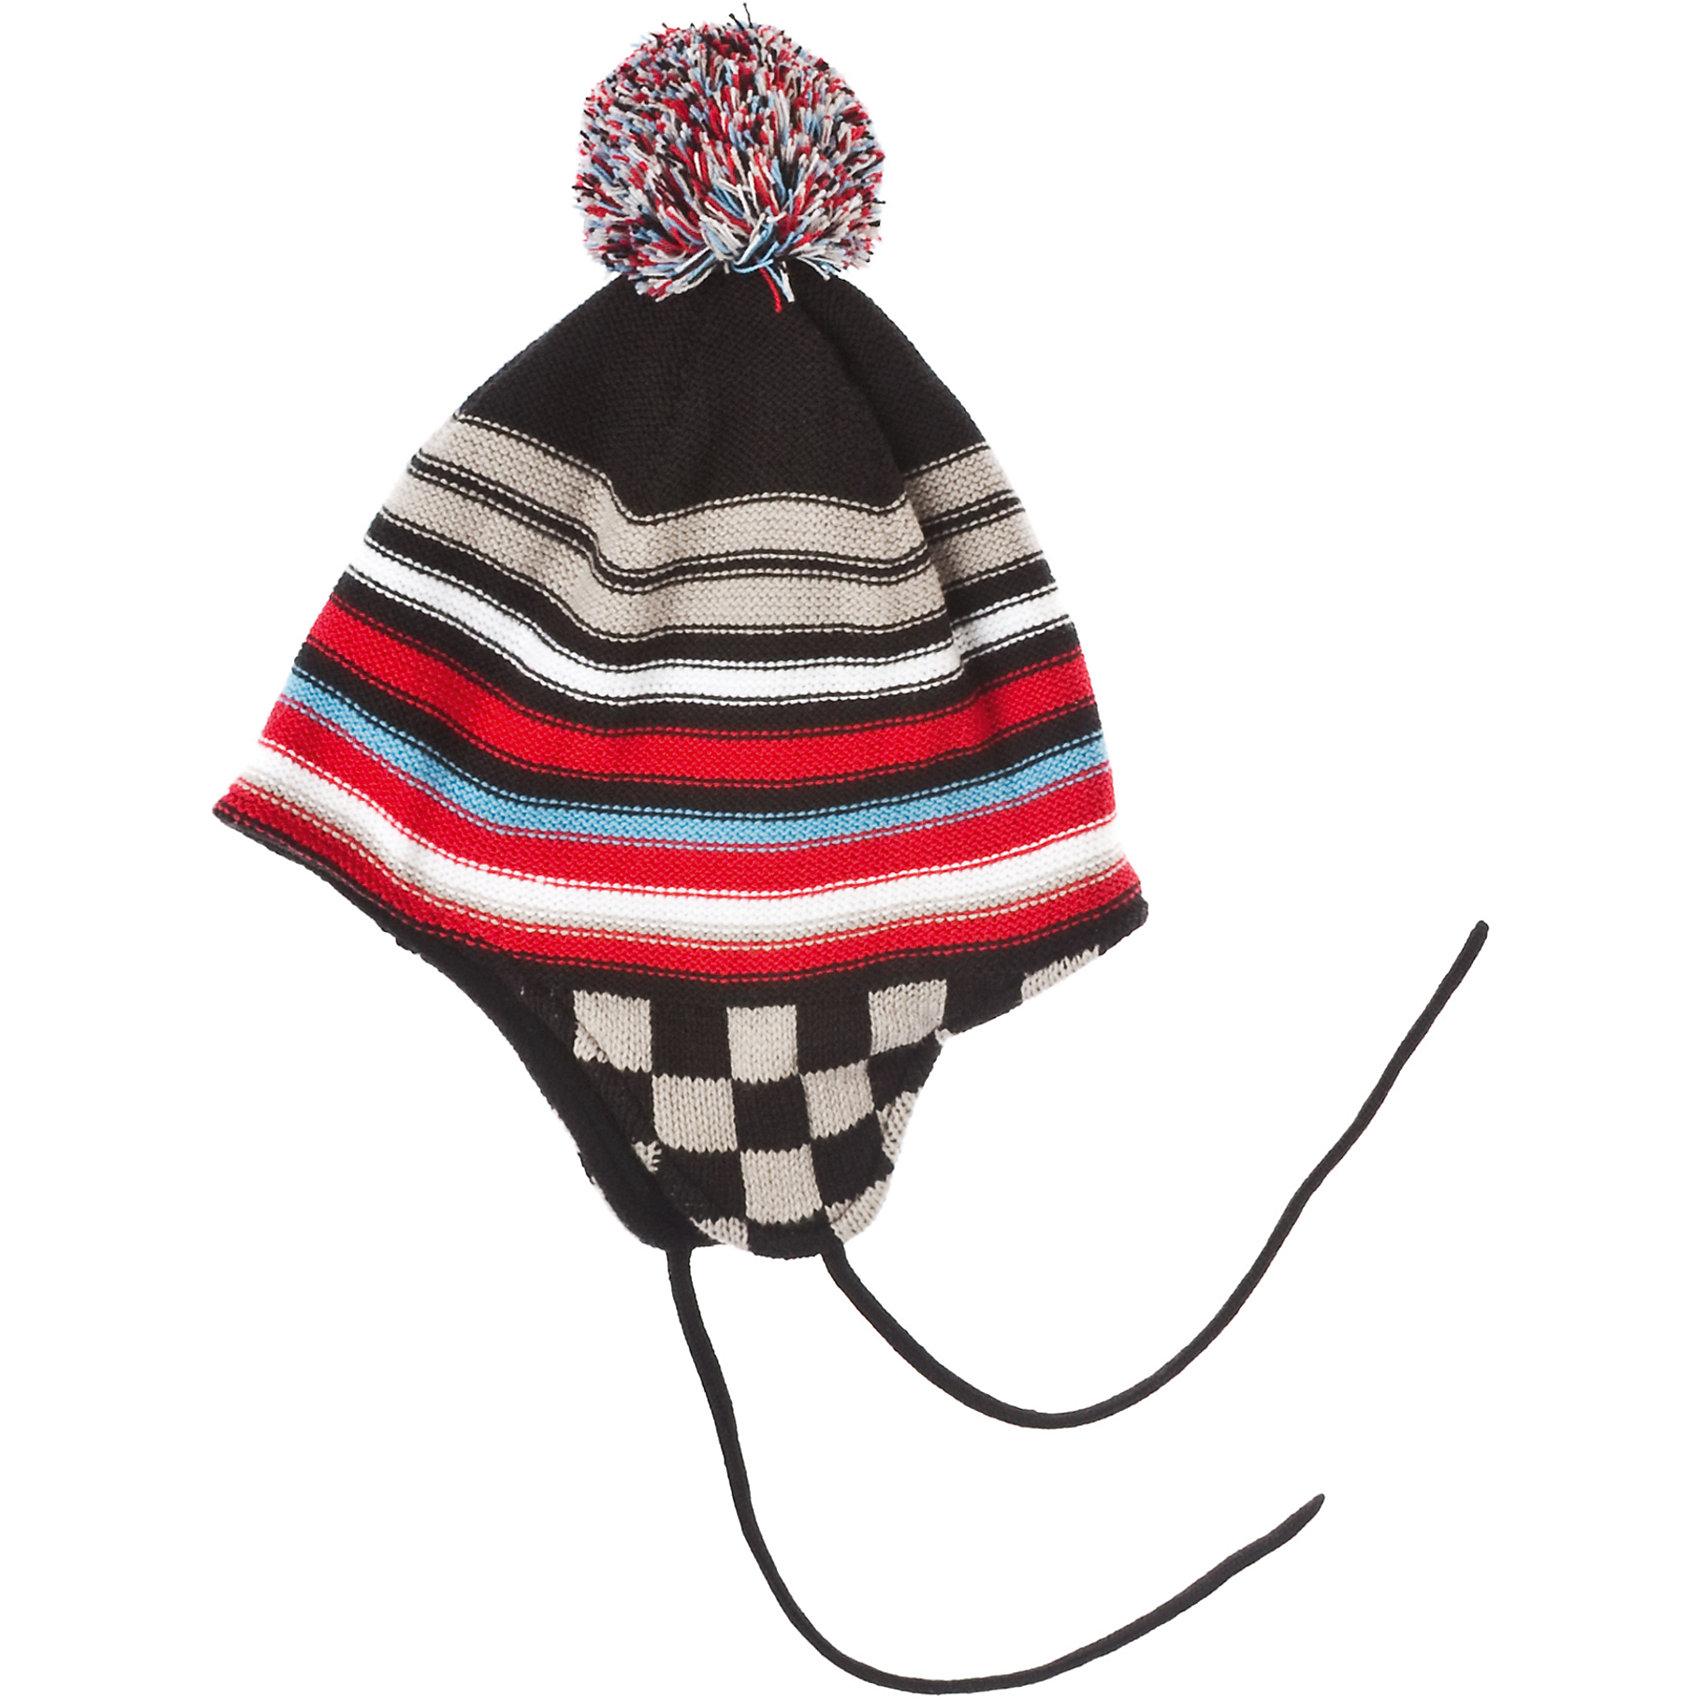 PlayToday Шапка для мальчика PlayToday шапка вязаная на подкладке button blue шапка вязаная на подкладке